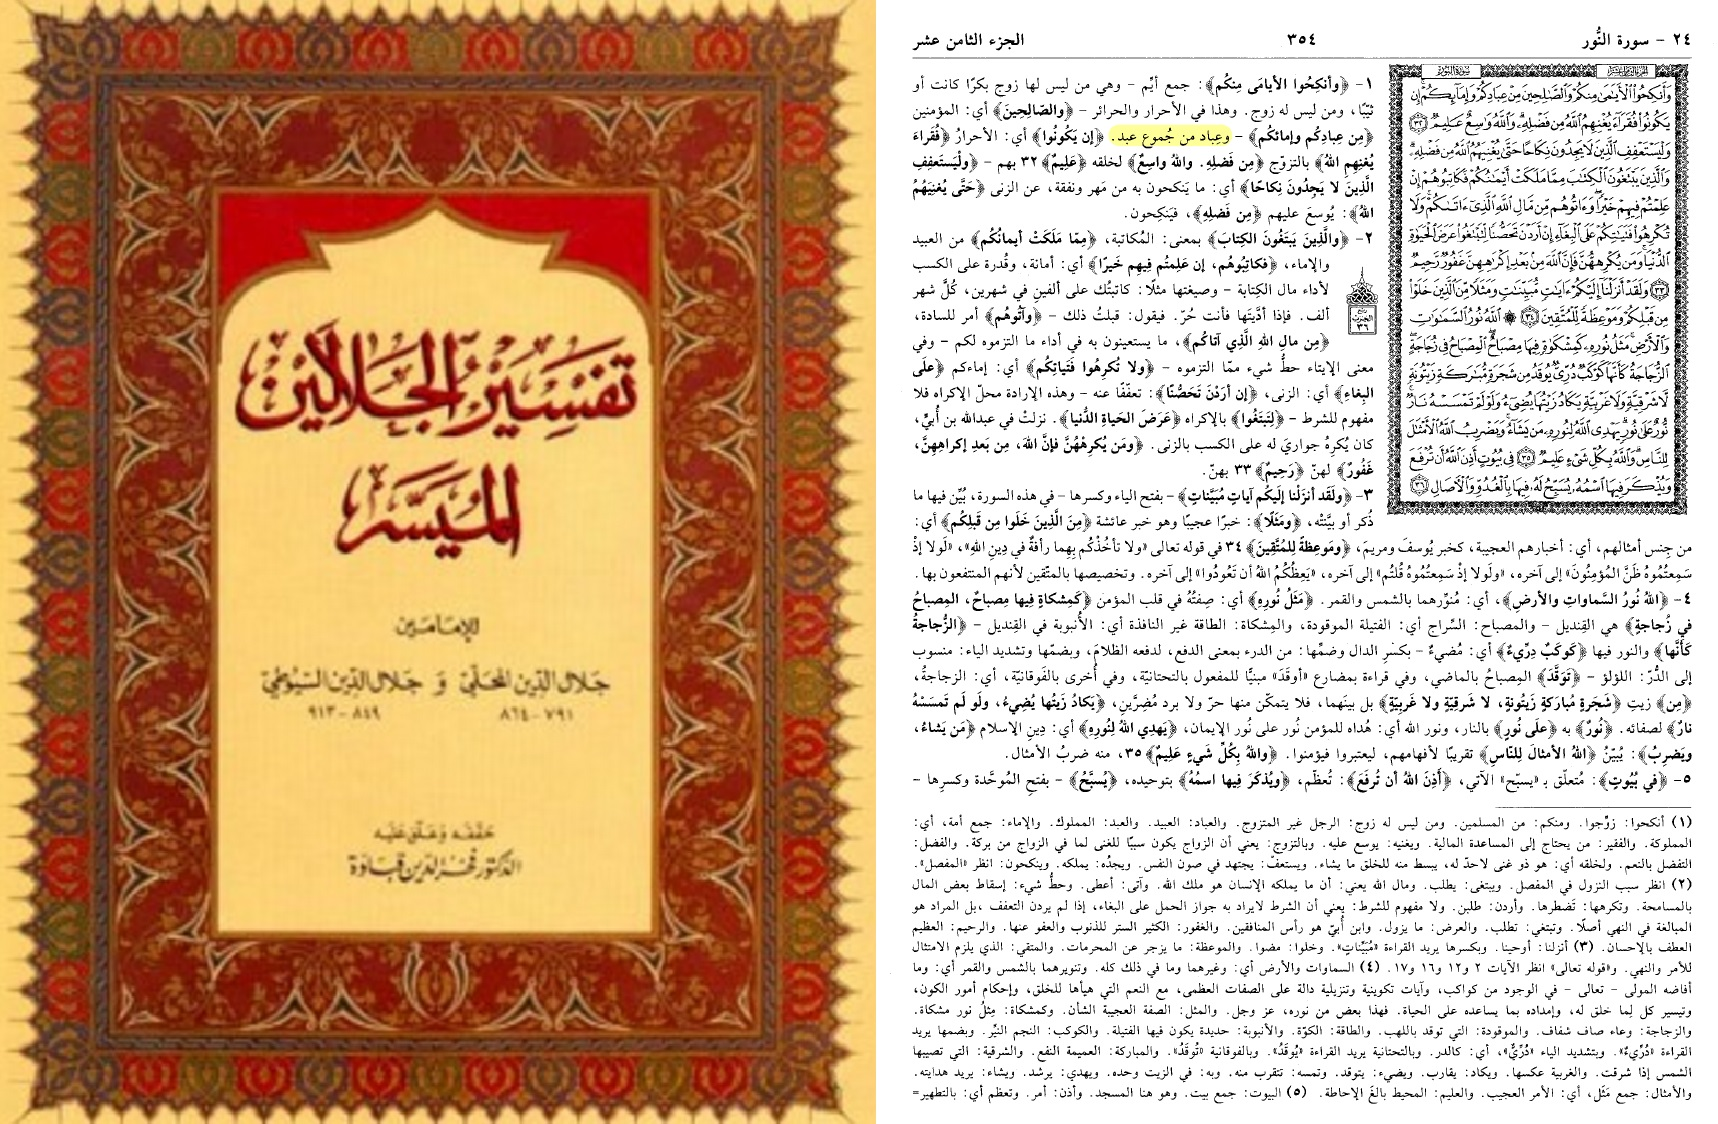 tafsir-e-jalalain-s-354